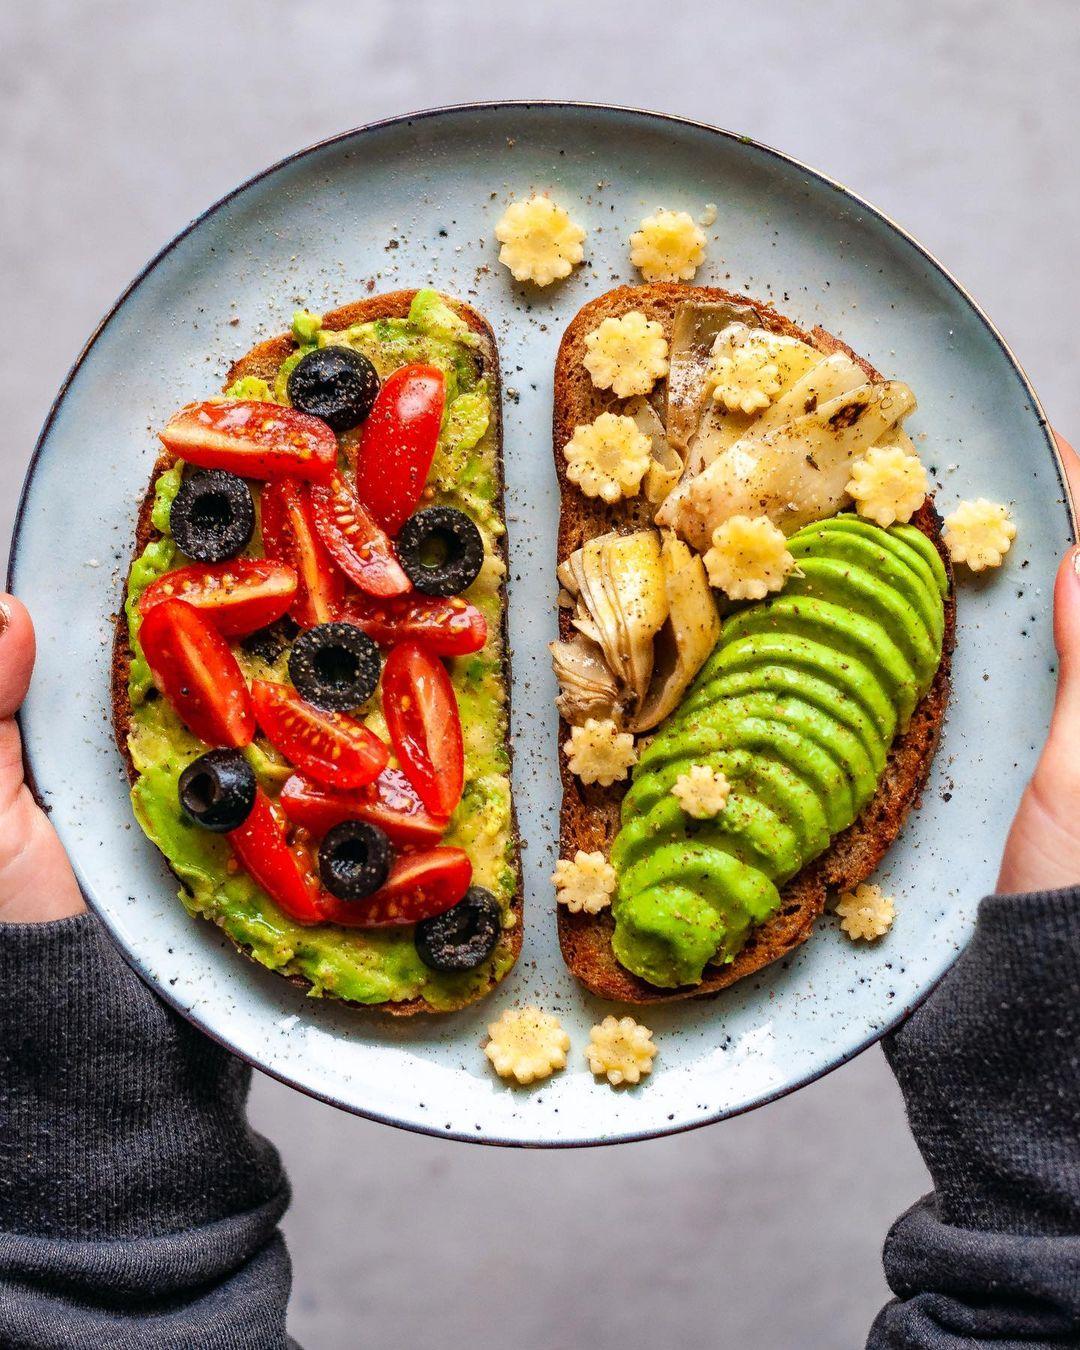 Eating Avocado for Hair Growth and Hair Health